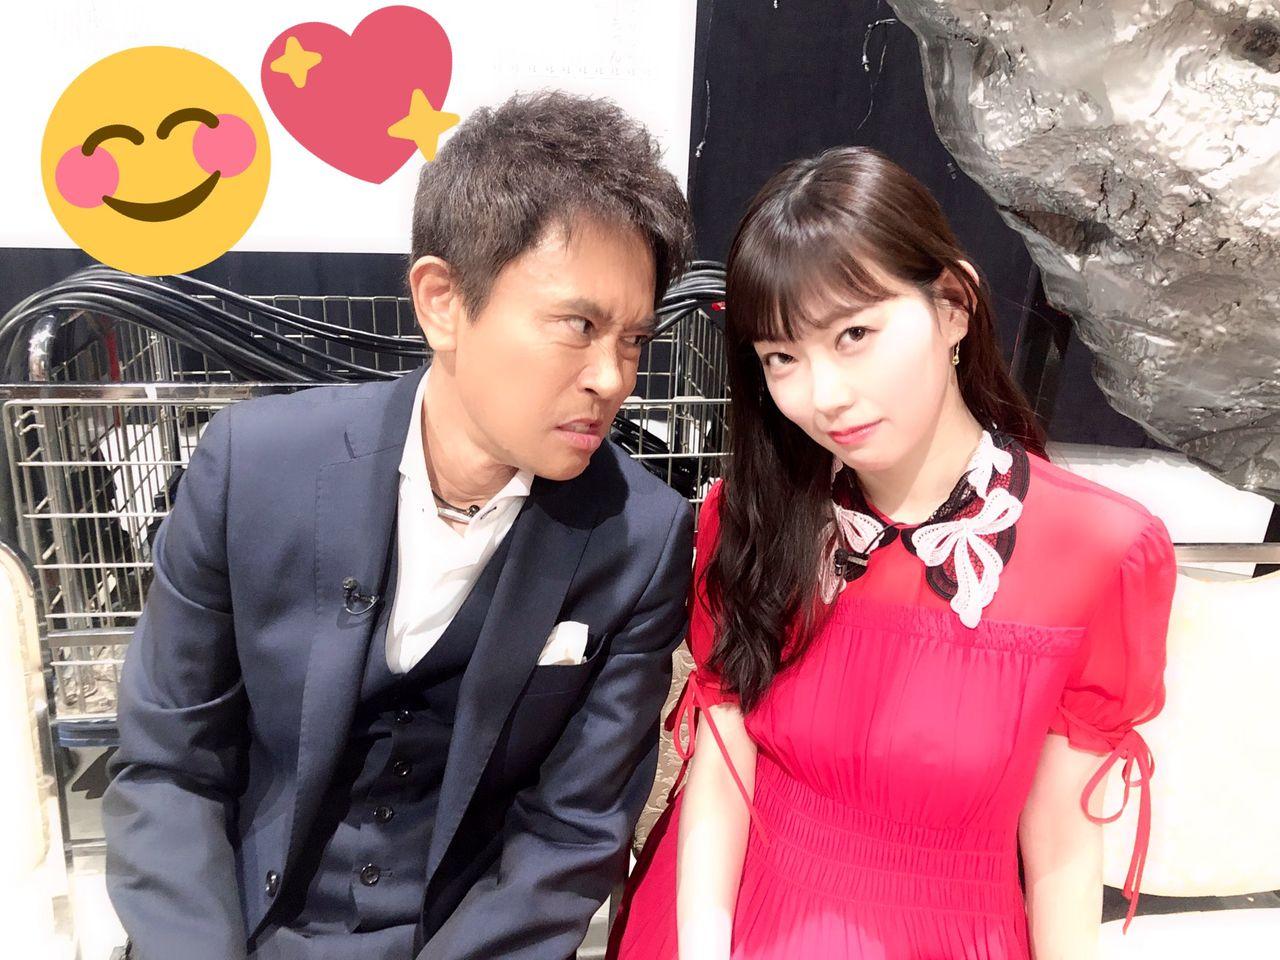 http://livedoor.blogimg.jp/bookman77-1000/imgs/5/5/551835fa.jpg